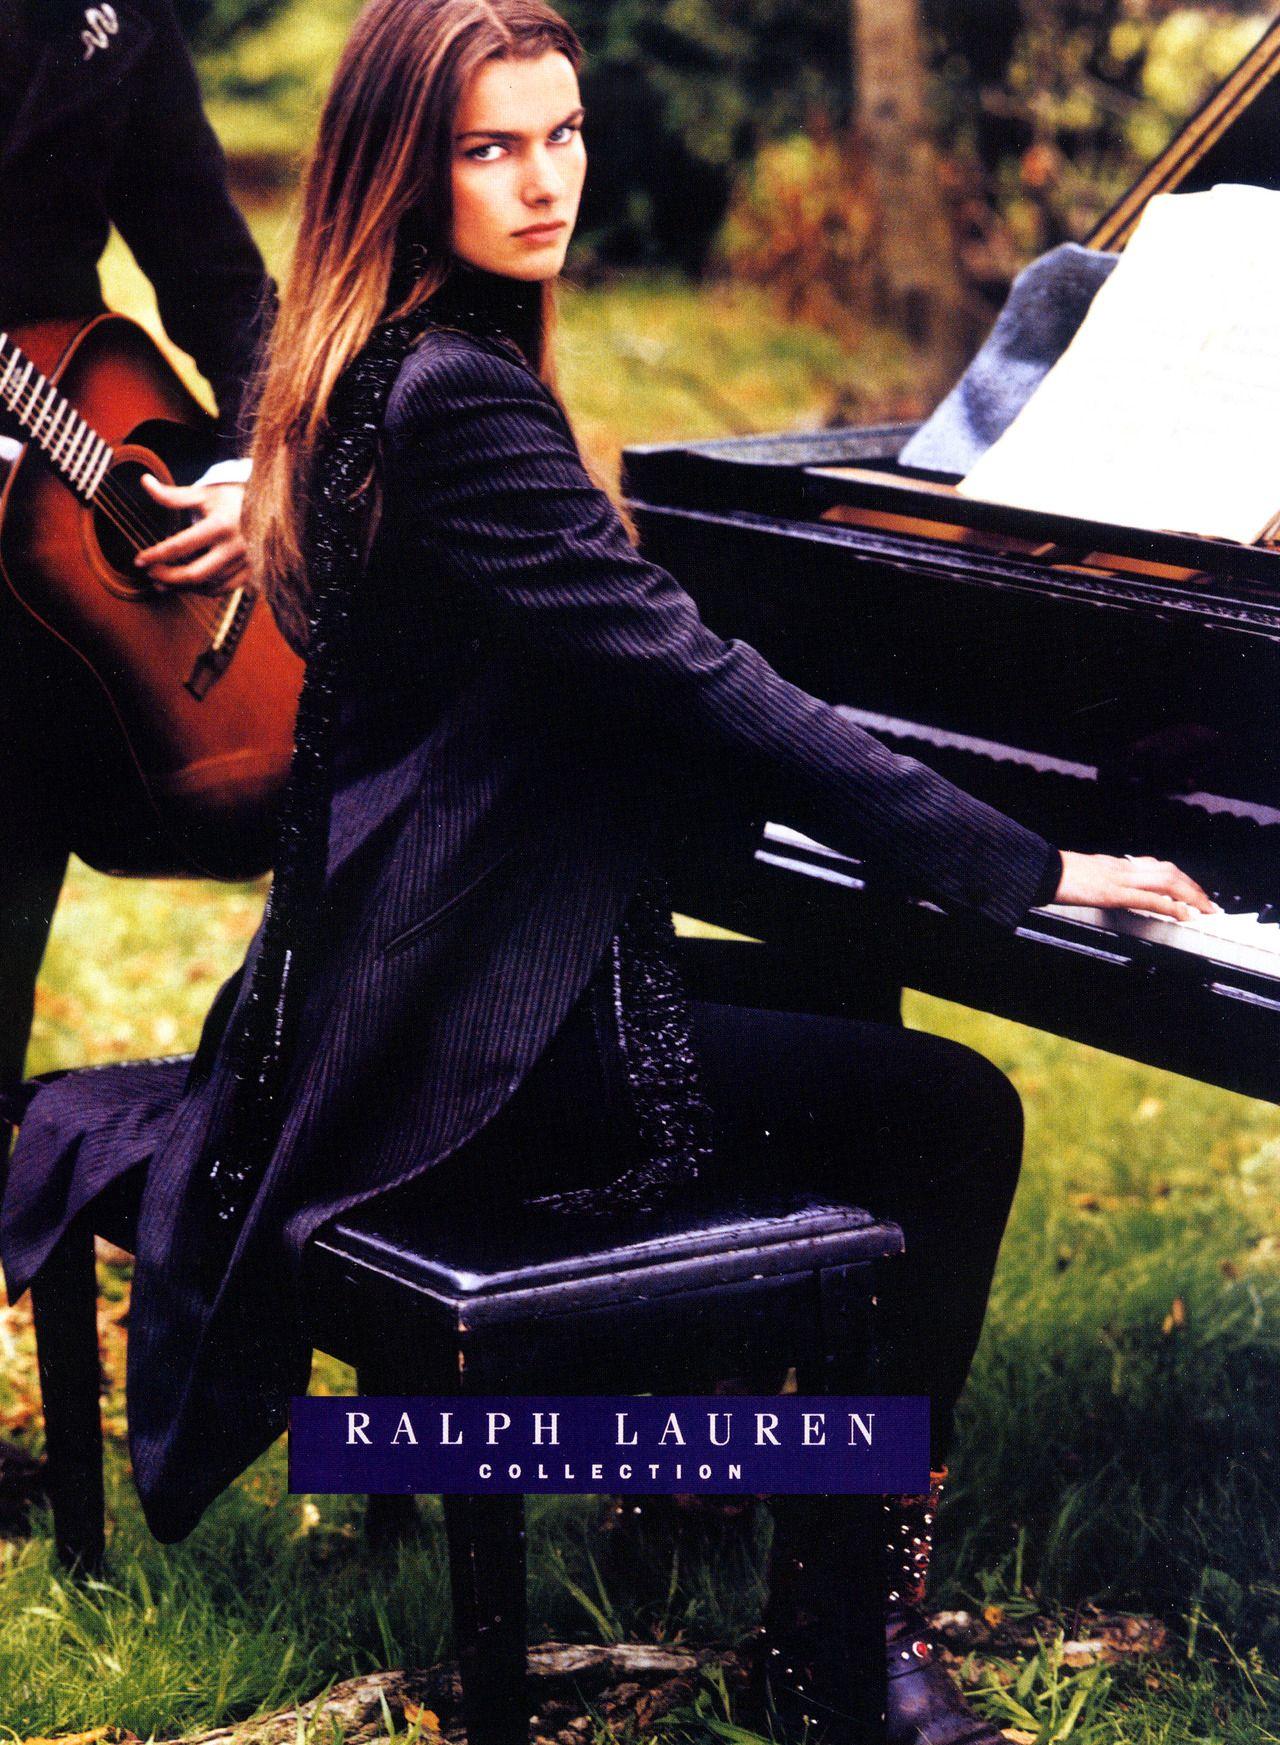 Lauren Old Ralph Rrl AdvertsPolo wPuOkXZiT